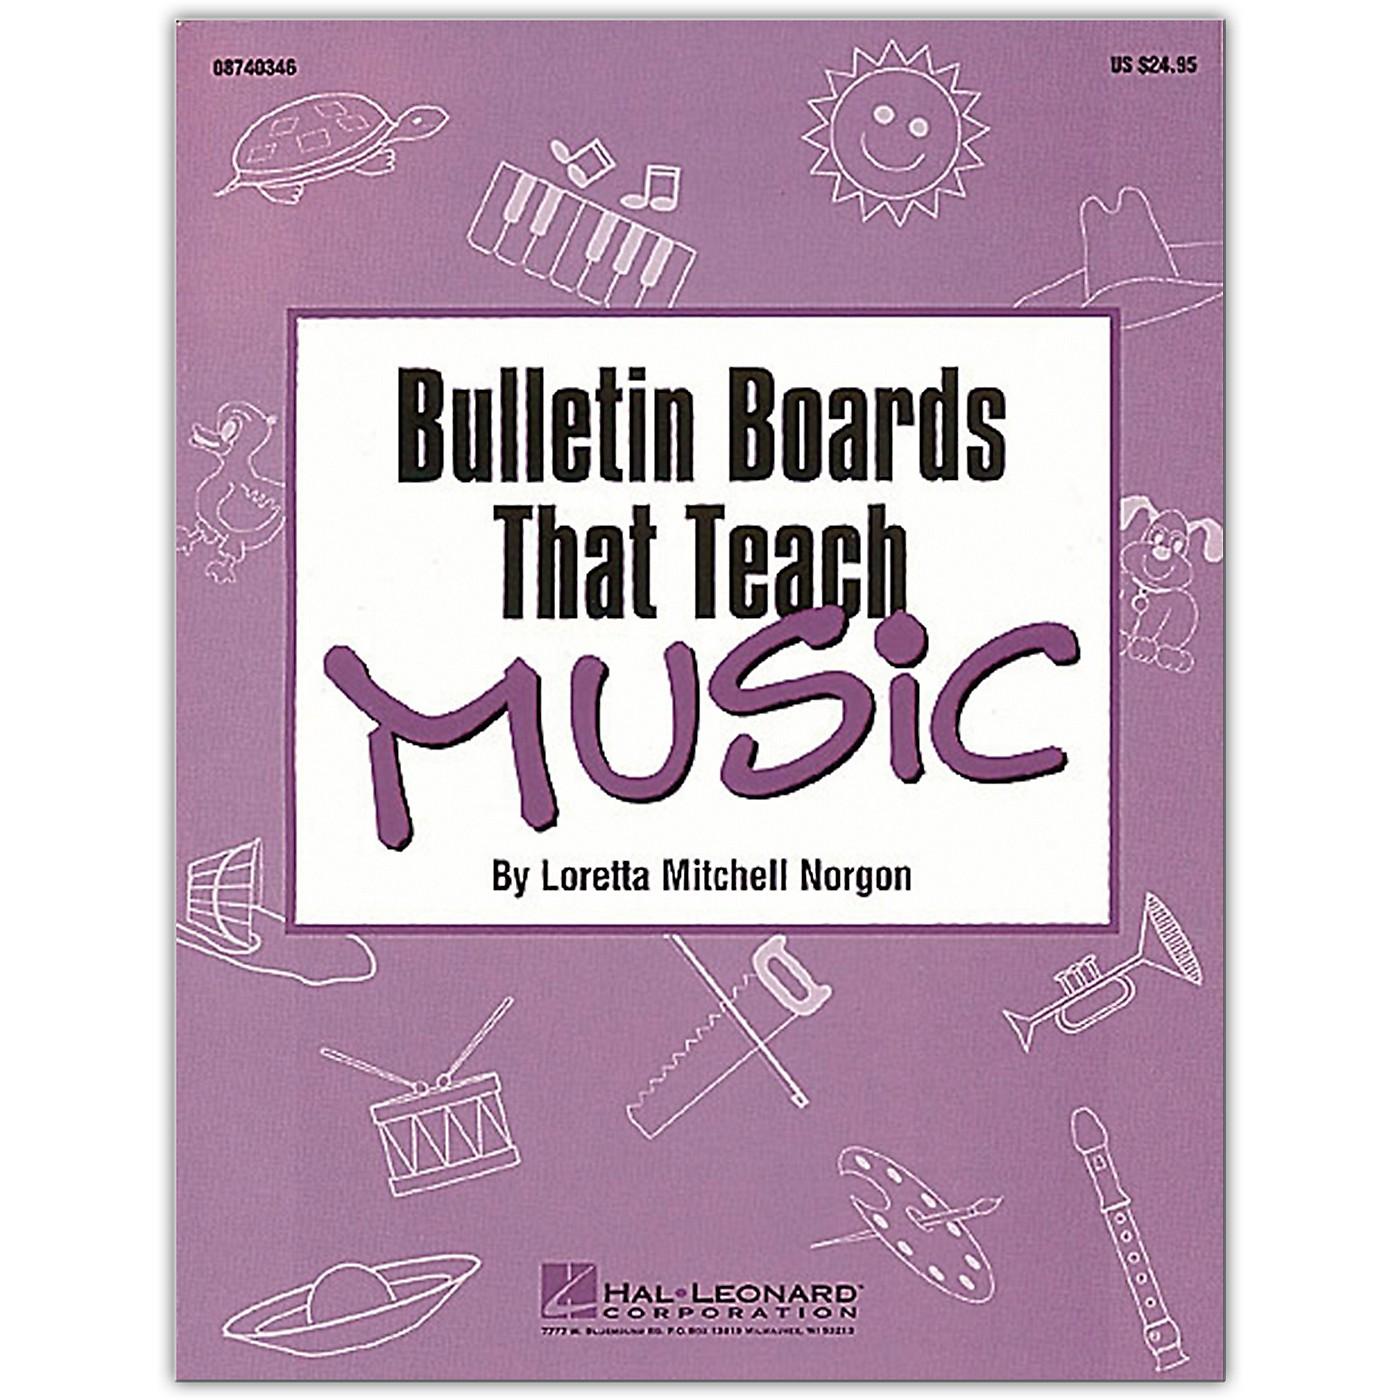 Hal Leonard Bulletin Boards That Teach Music Book thumbnail